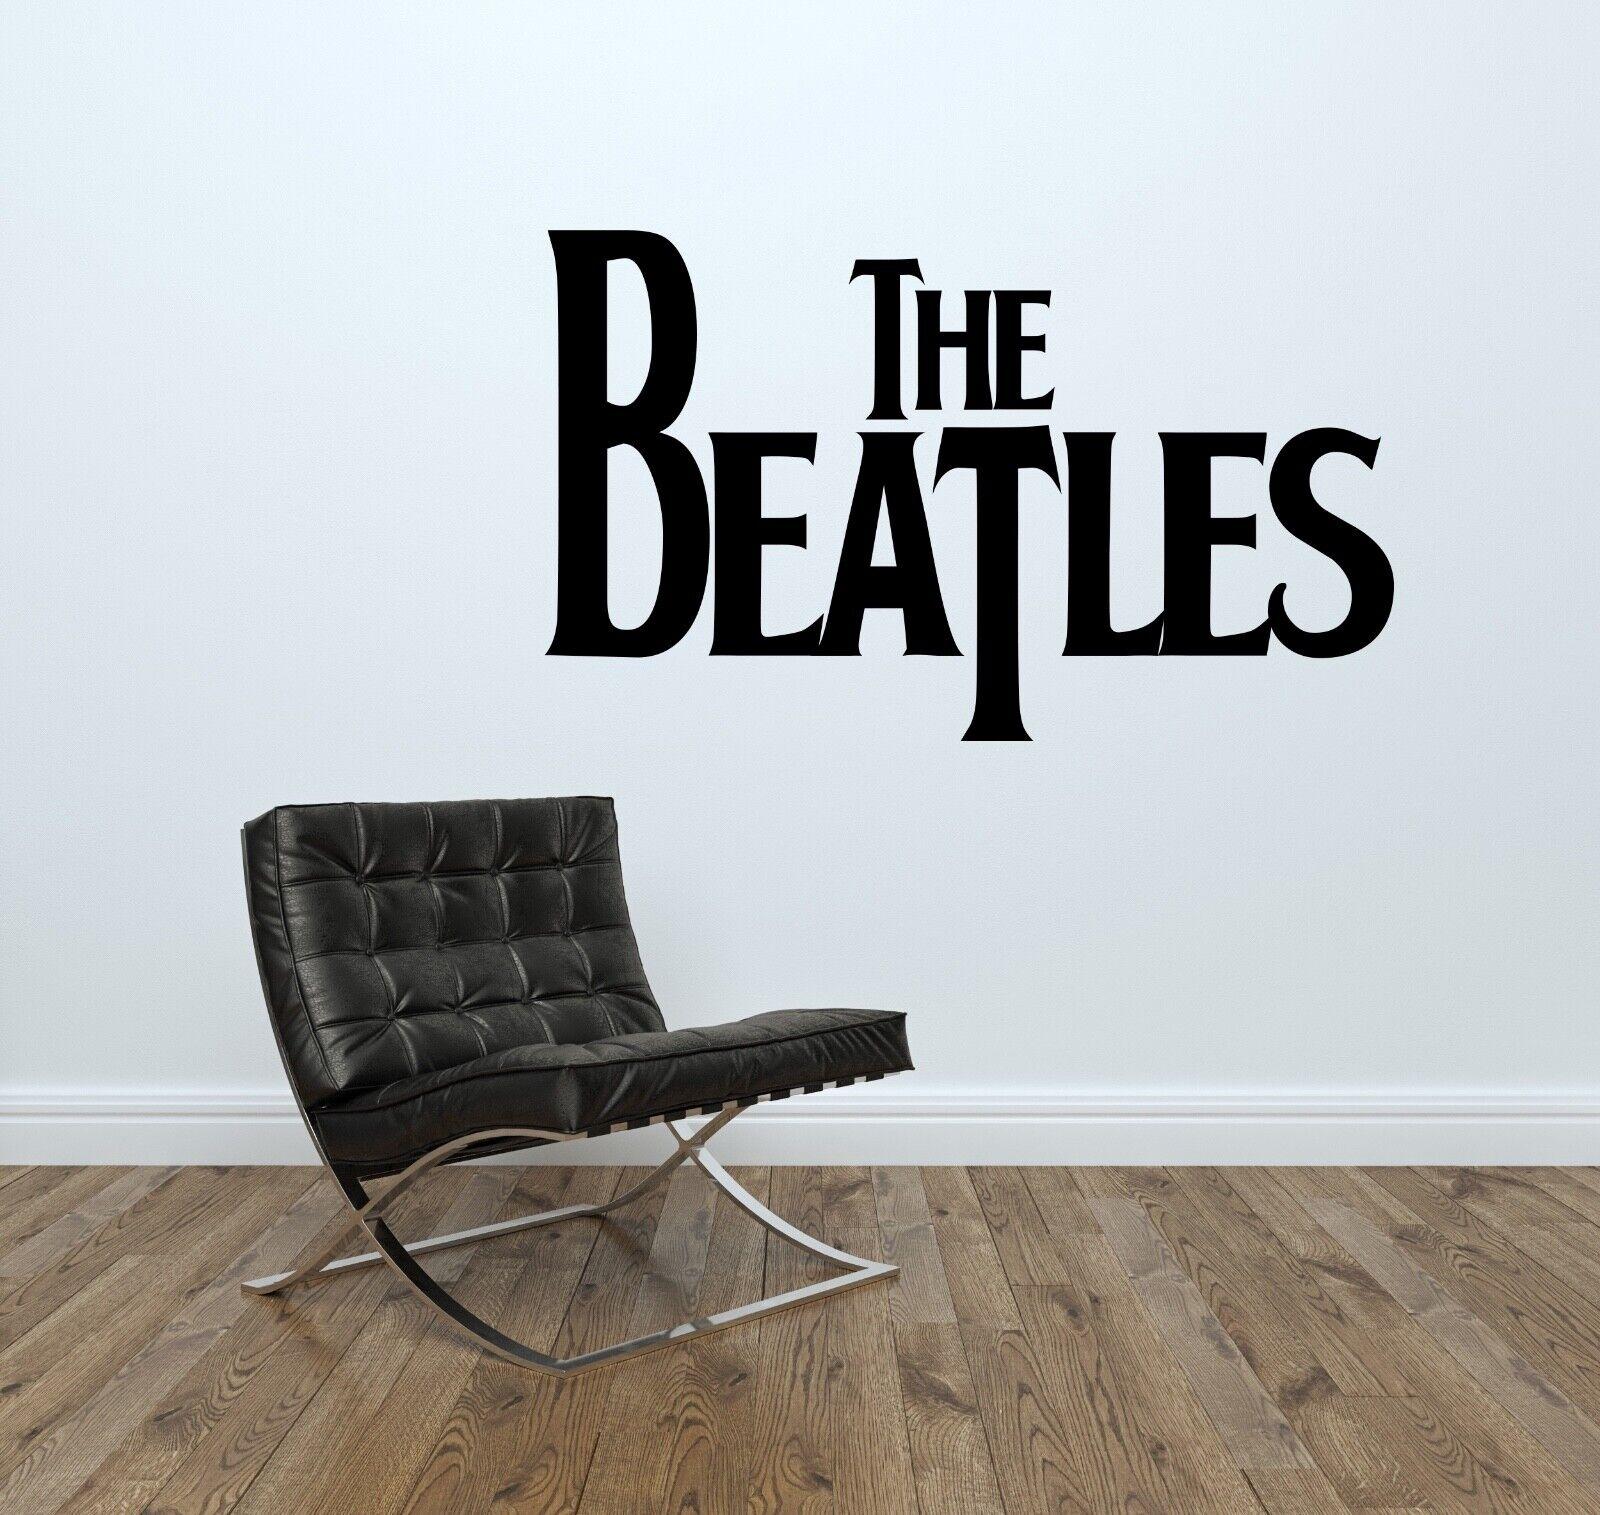 The Beatles WALL STICKER Decal Home Decor Art Mural Stencil Silhouette ST131